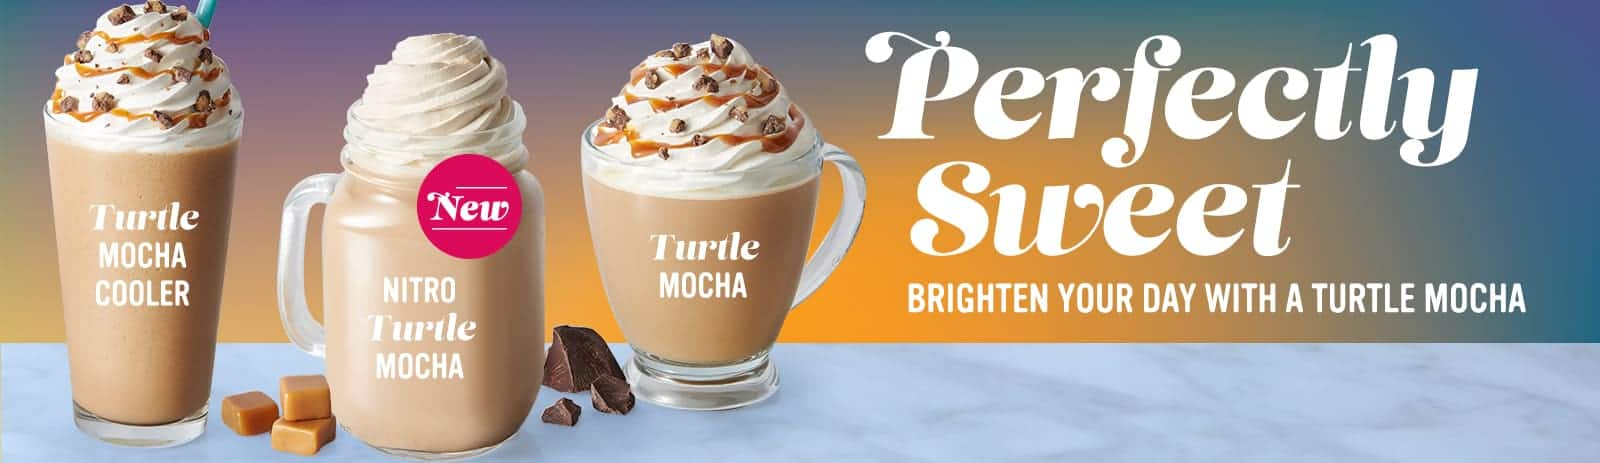 Perfectly Sweet Beverage Trio Turtle Mocha Three ways